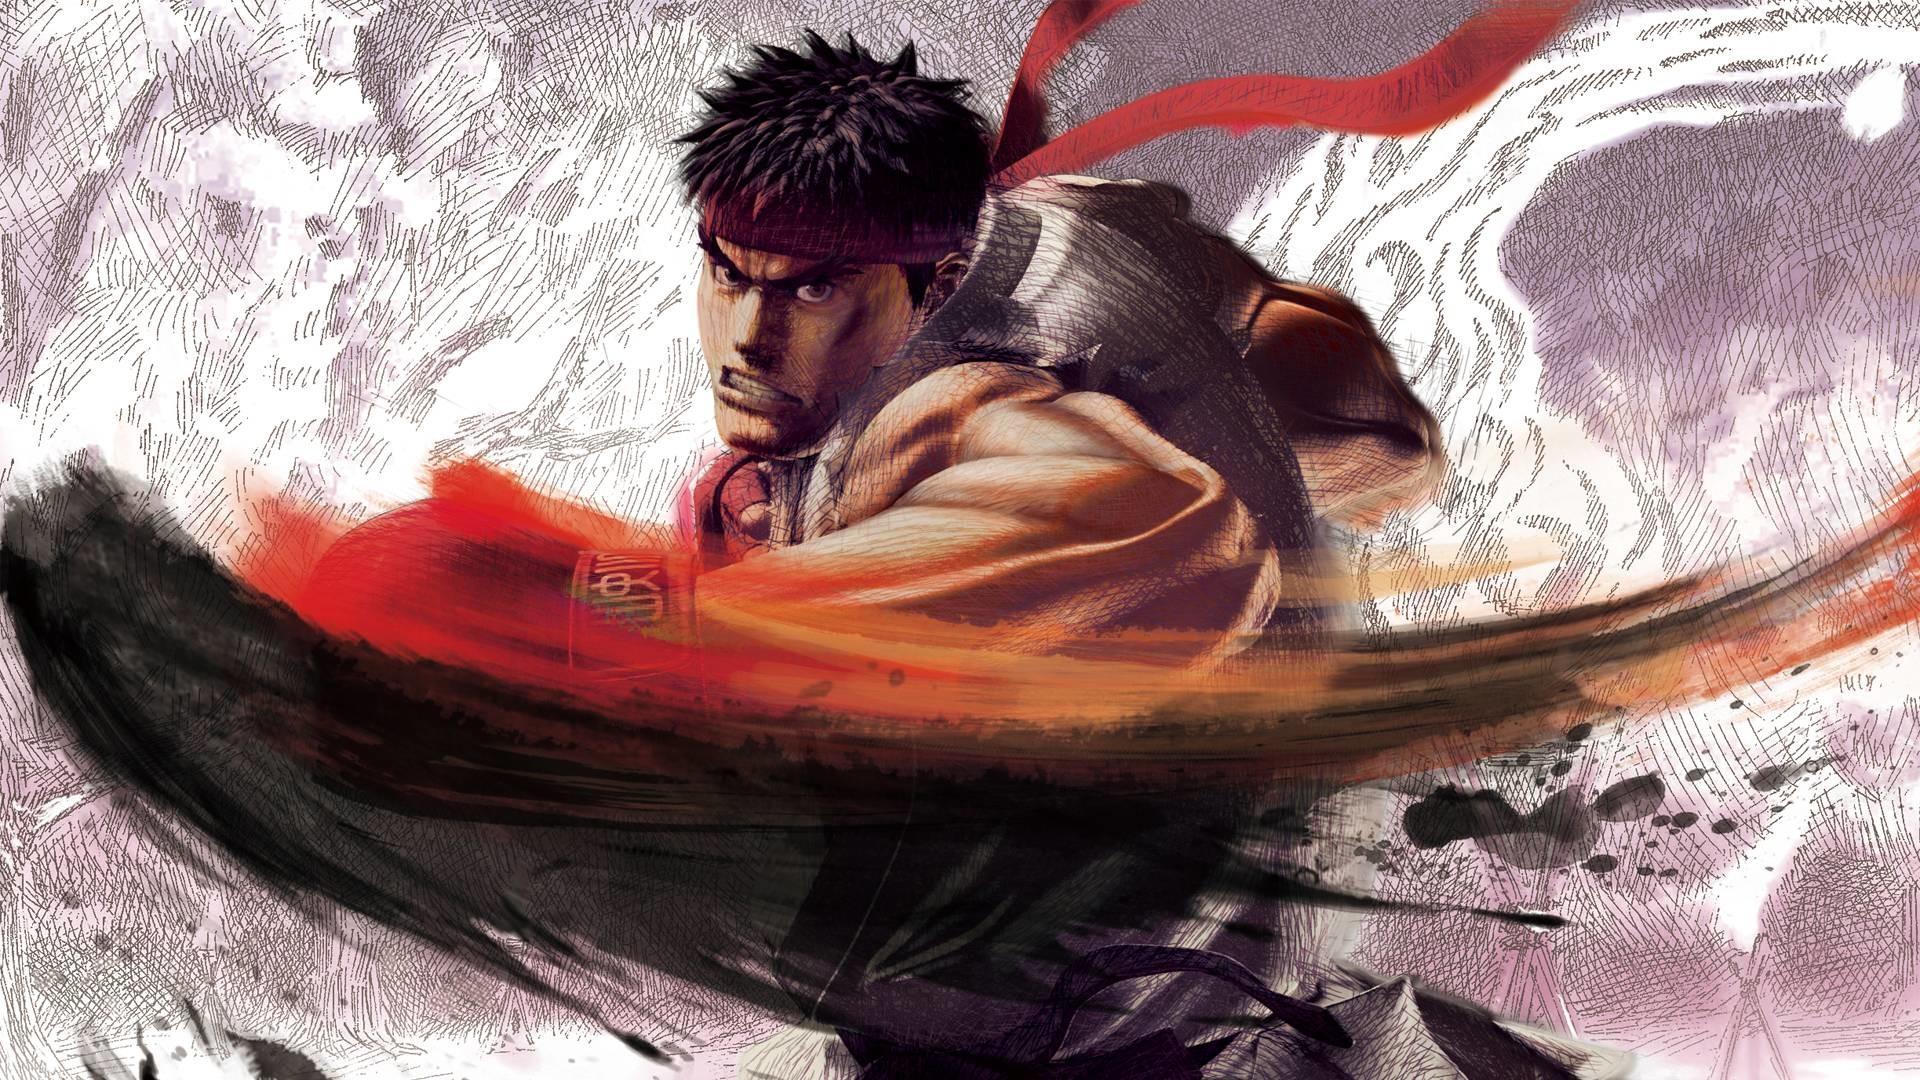 Super Street Fighter 4 Wallpaper 1080p